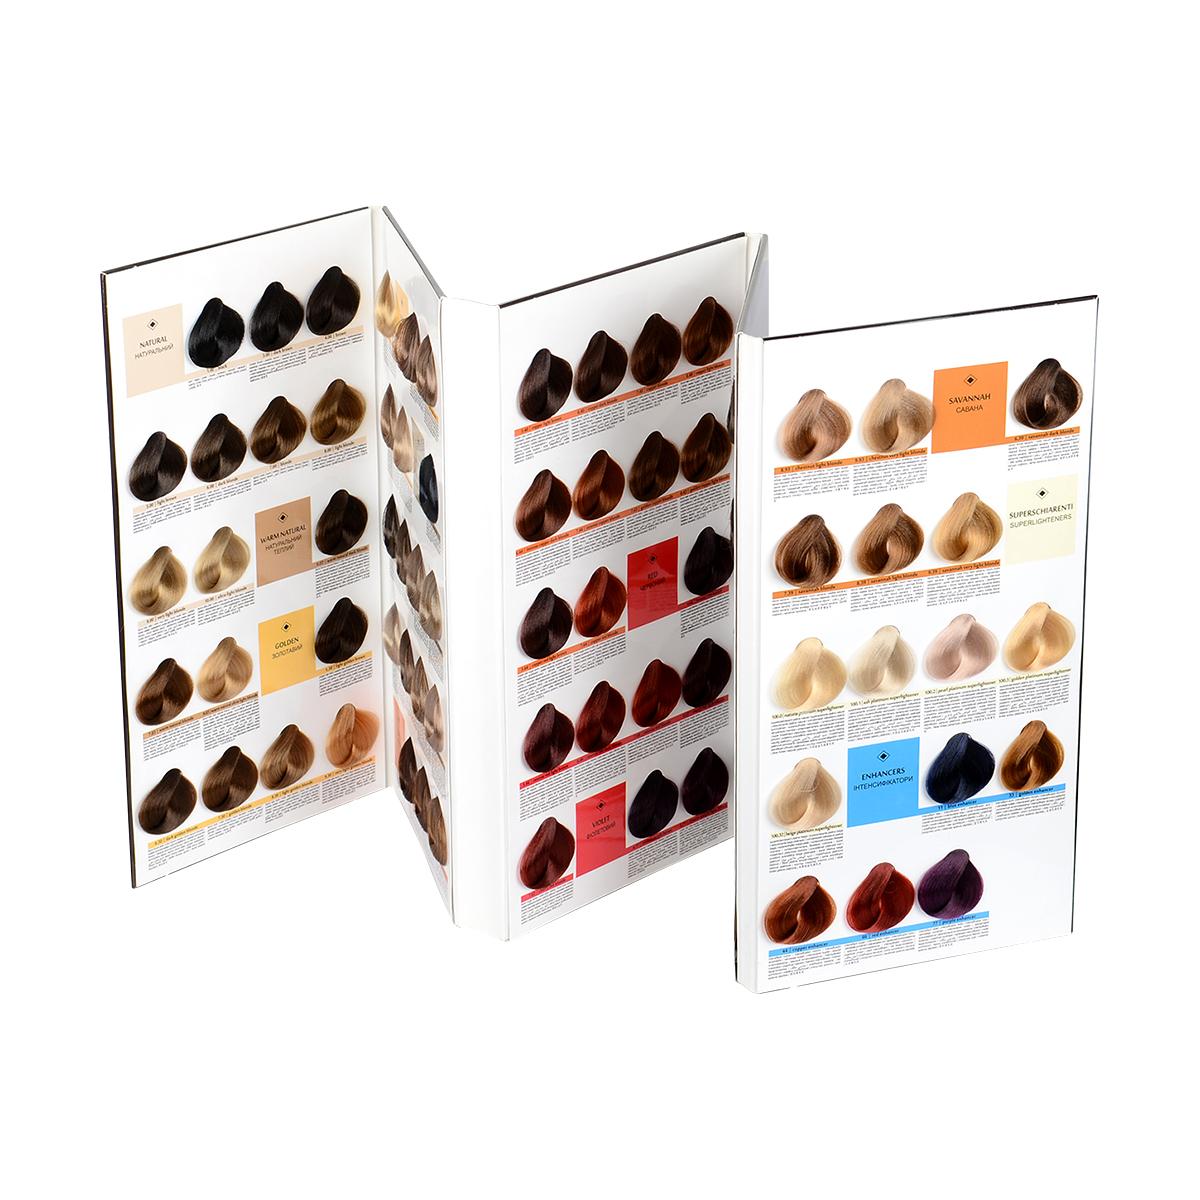 mchier nuancier coloration prestige - Coloration Nuancier